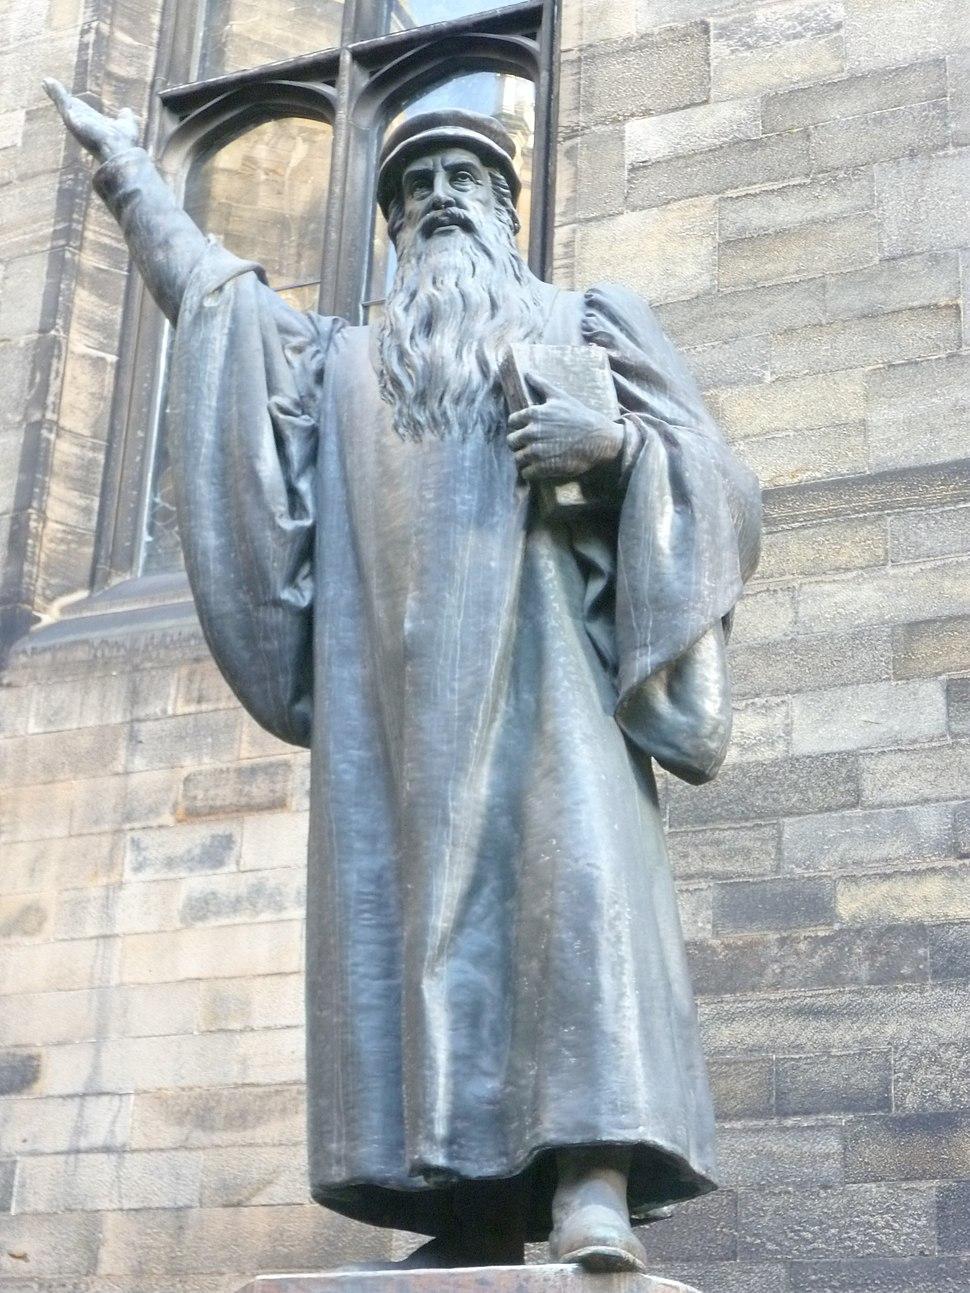 Statue of John Knox in New College quadrangle, Edinburgh